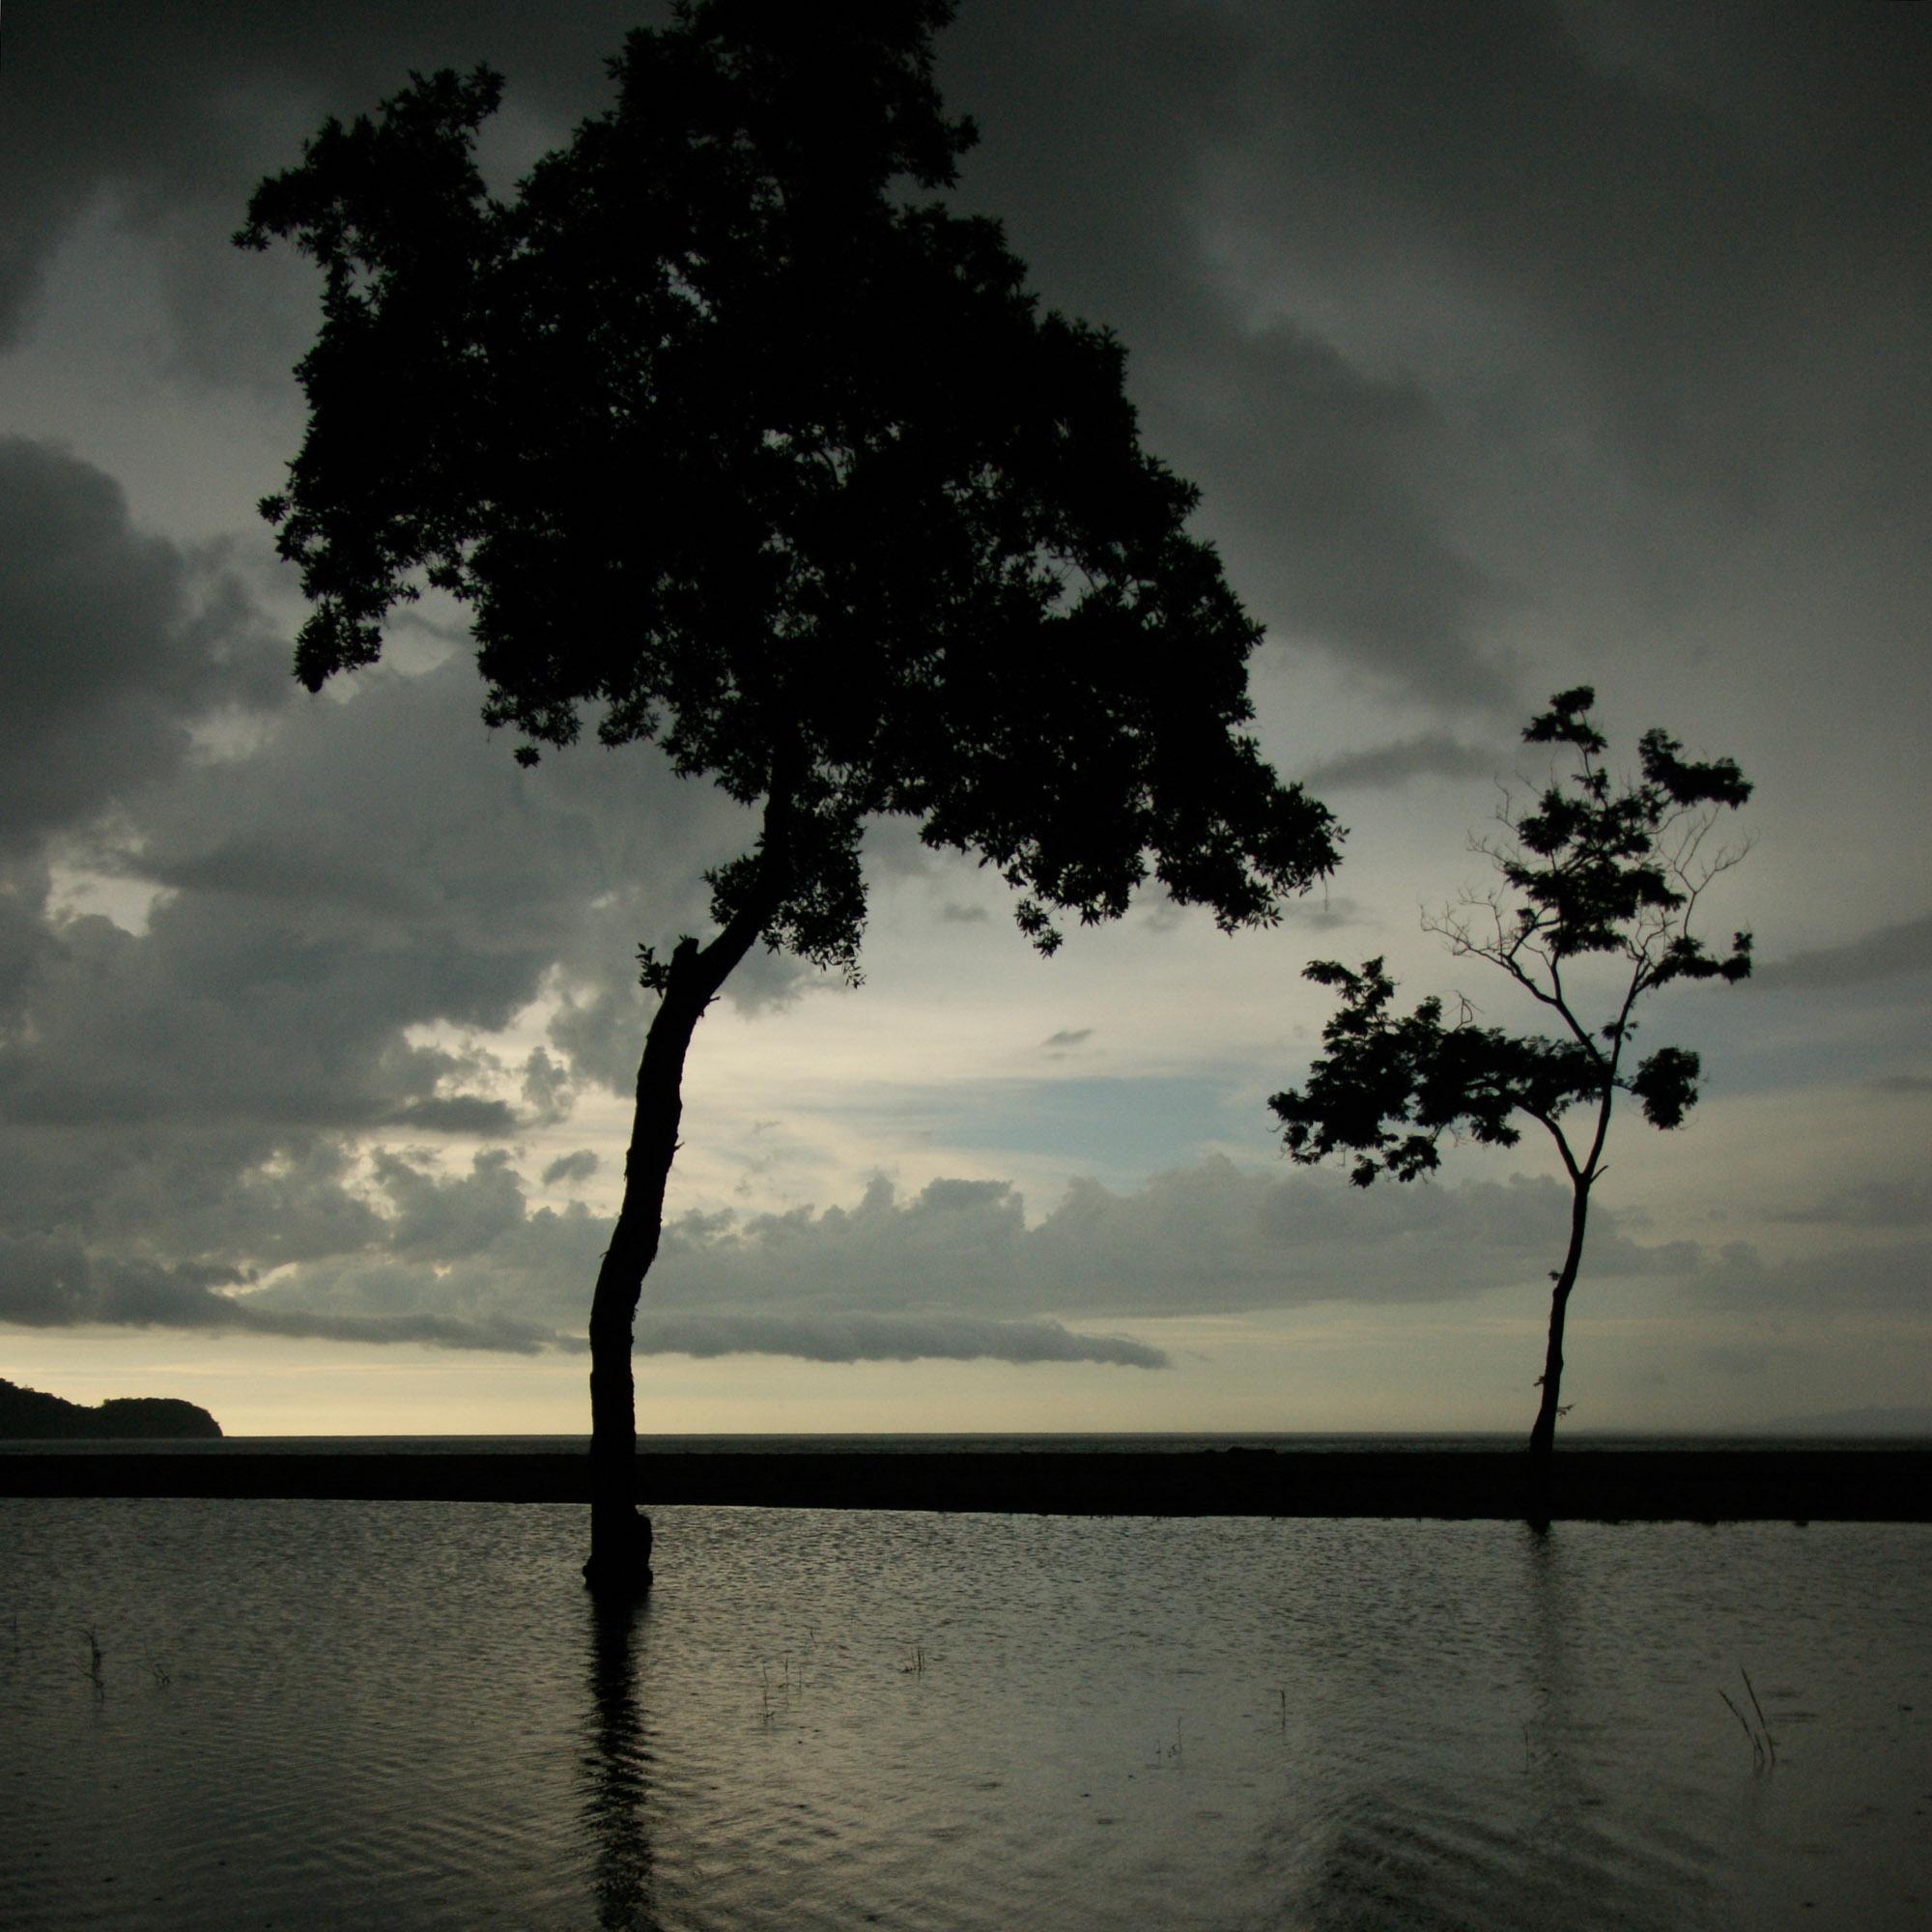 natuur, bomen in silhouet, Studio MT